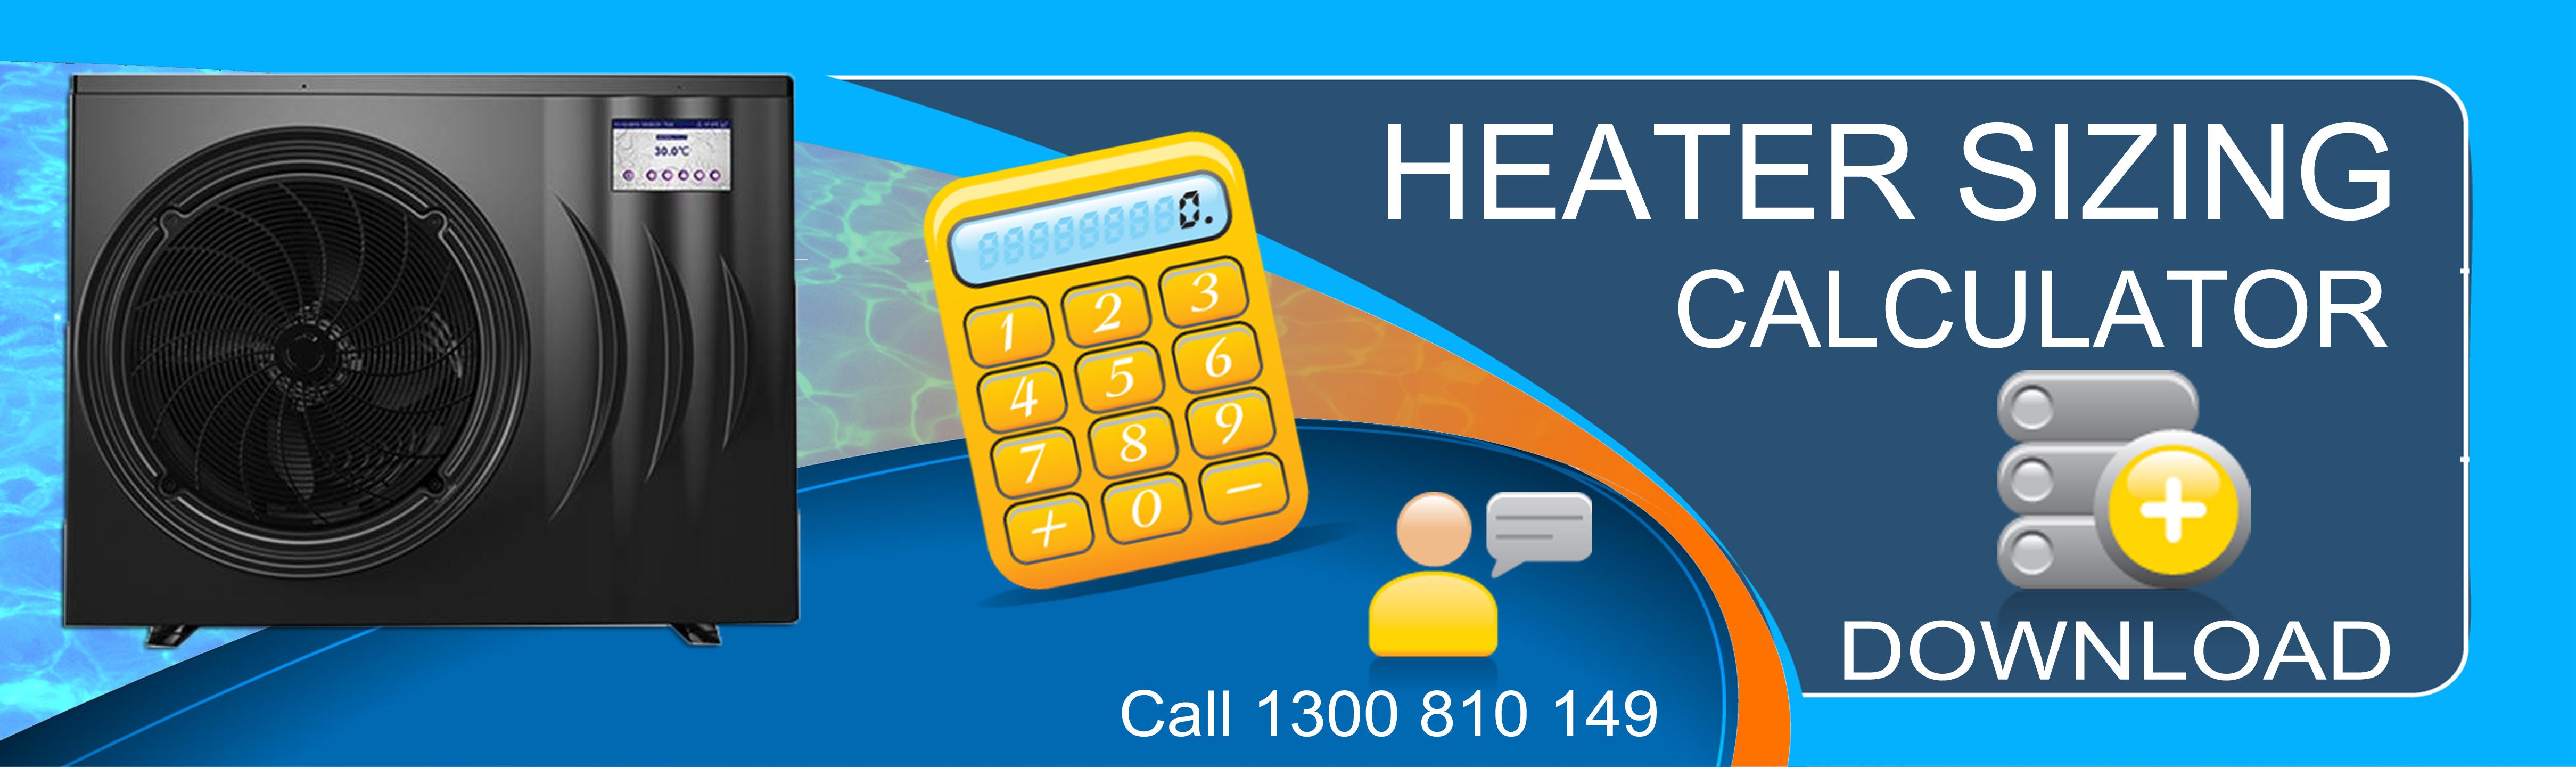 heater-sizing-calculator